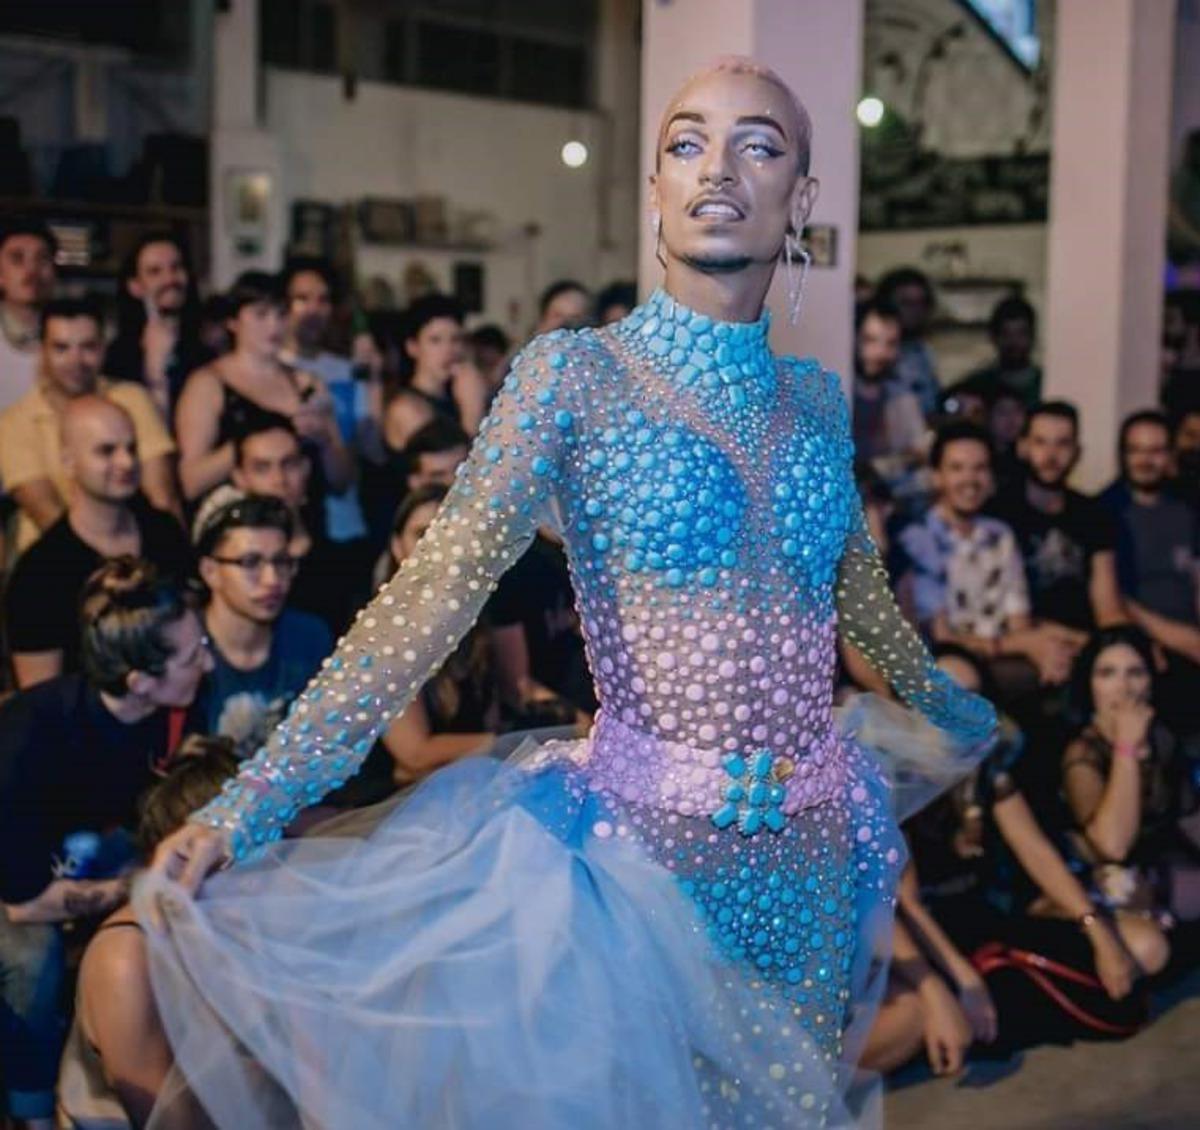 Mellany Bounce, Translumbrante Ball (2018), foto por Bruna Brandão.